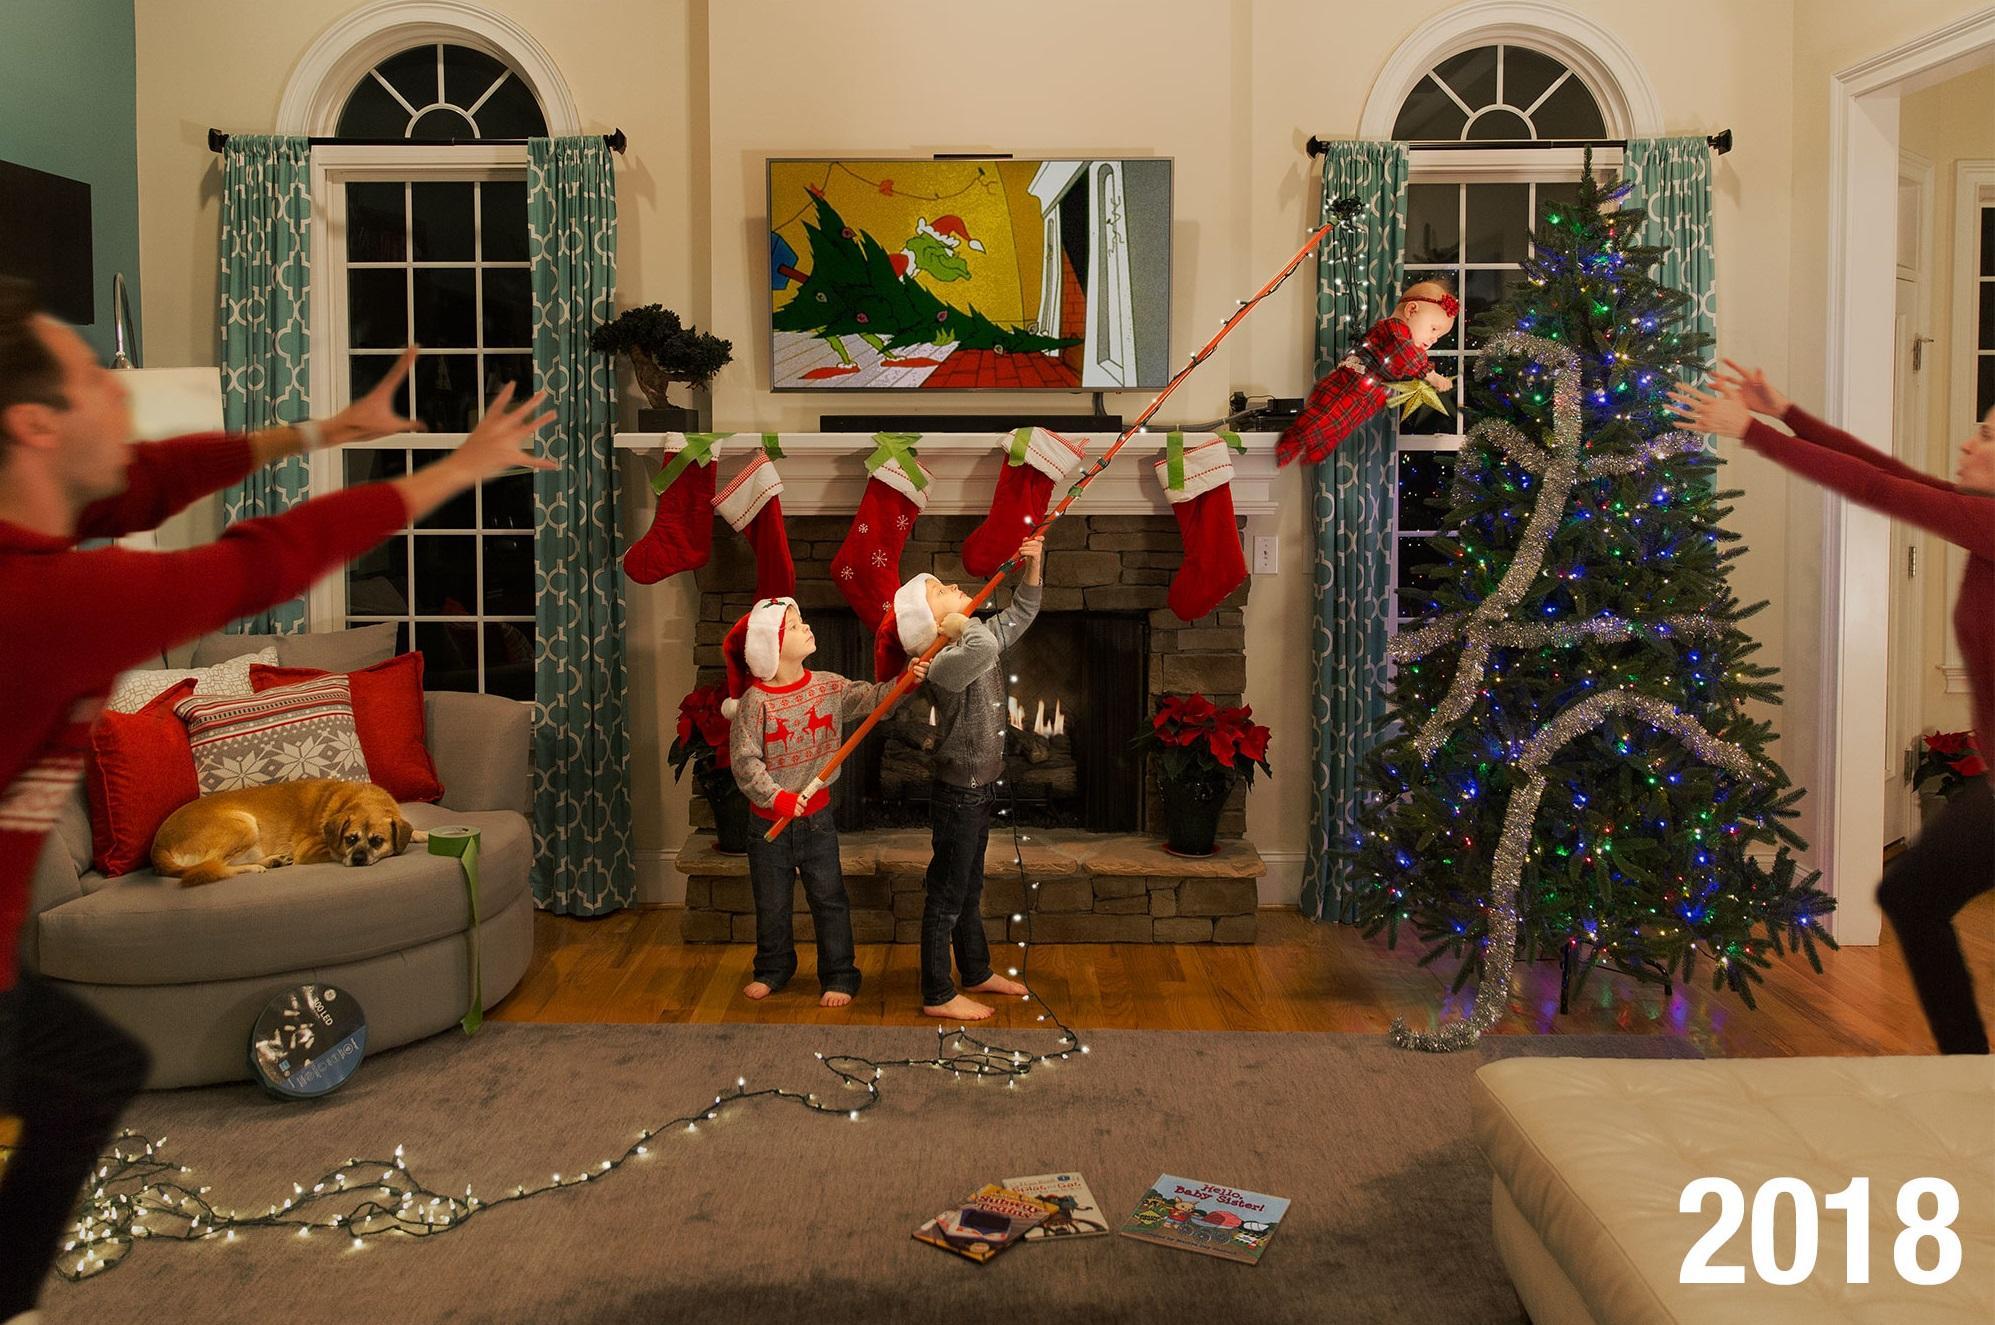 real-family-christmas-cards-2-1544816804410.jpg